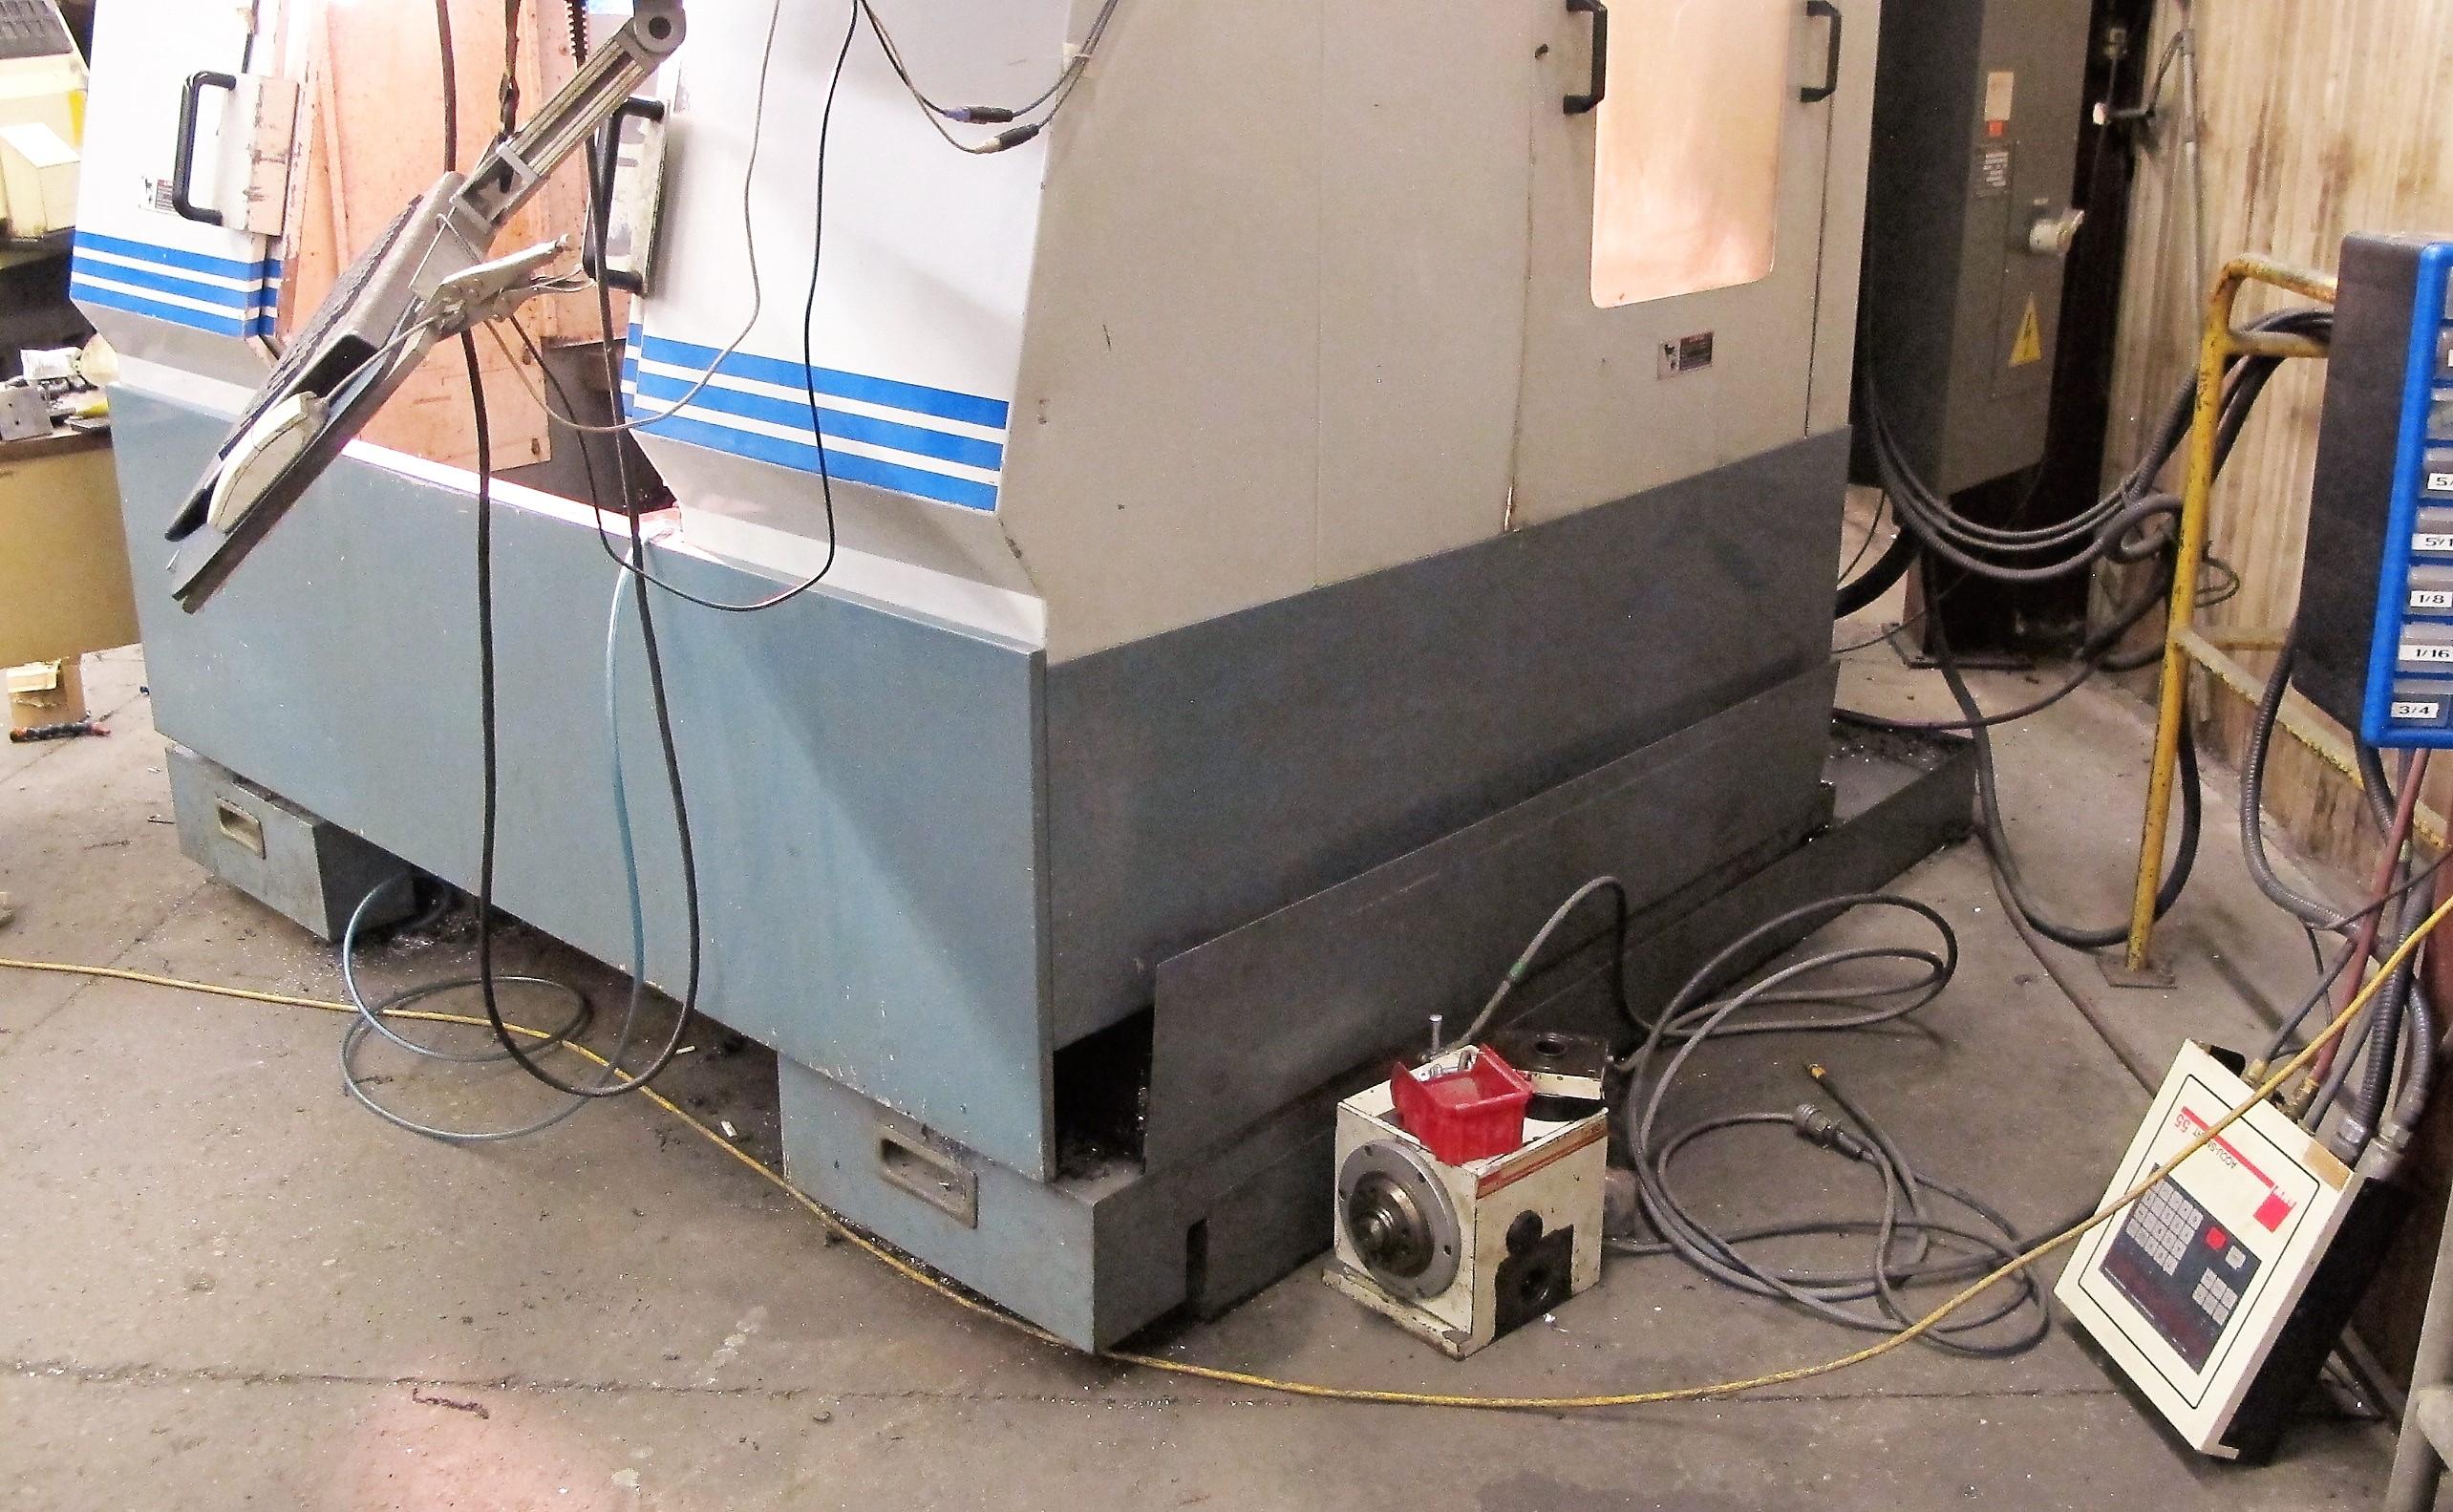 "TREEVMC 800/20 CNC VERTICAL MACHINING CENTER, S/N TS80900014U, PC-2100 CNC CONTROL, ATC, 25"" x - Image 15 of 16"